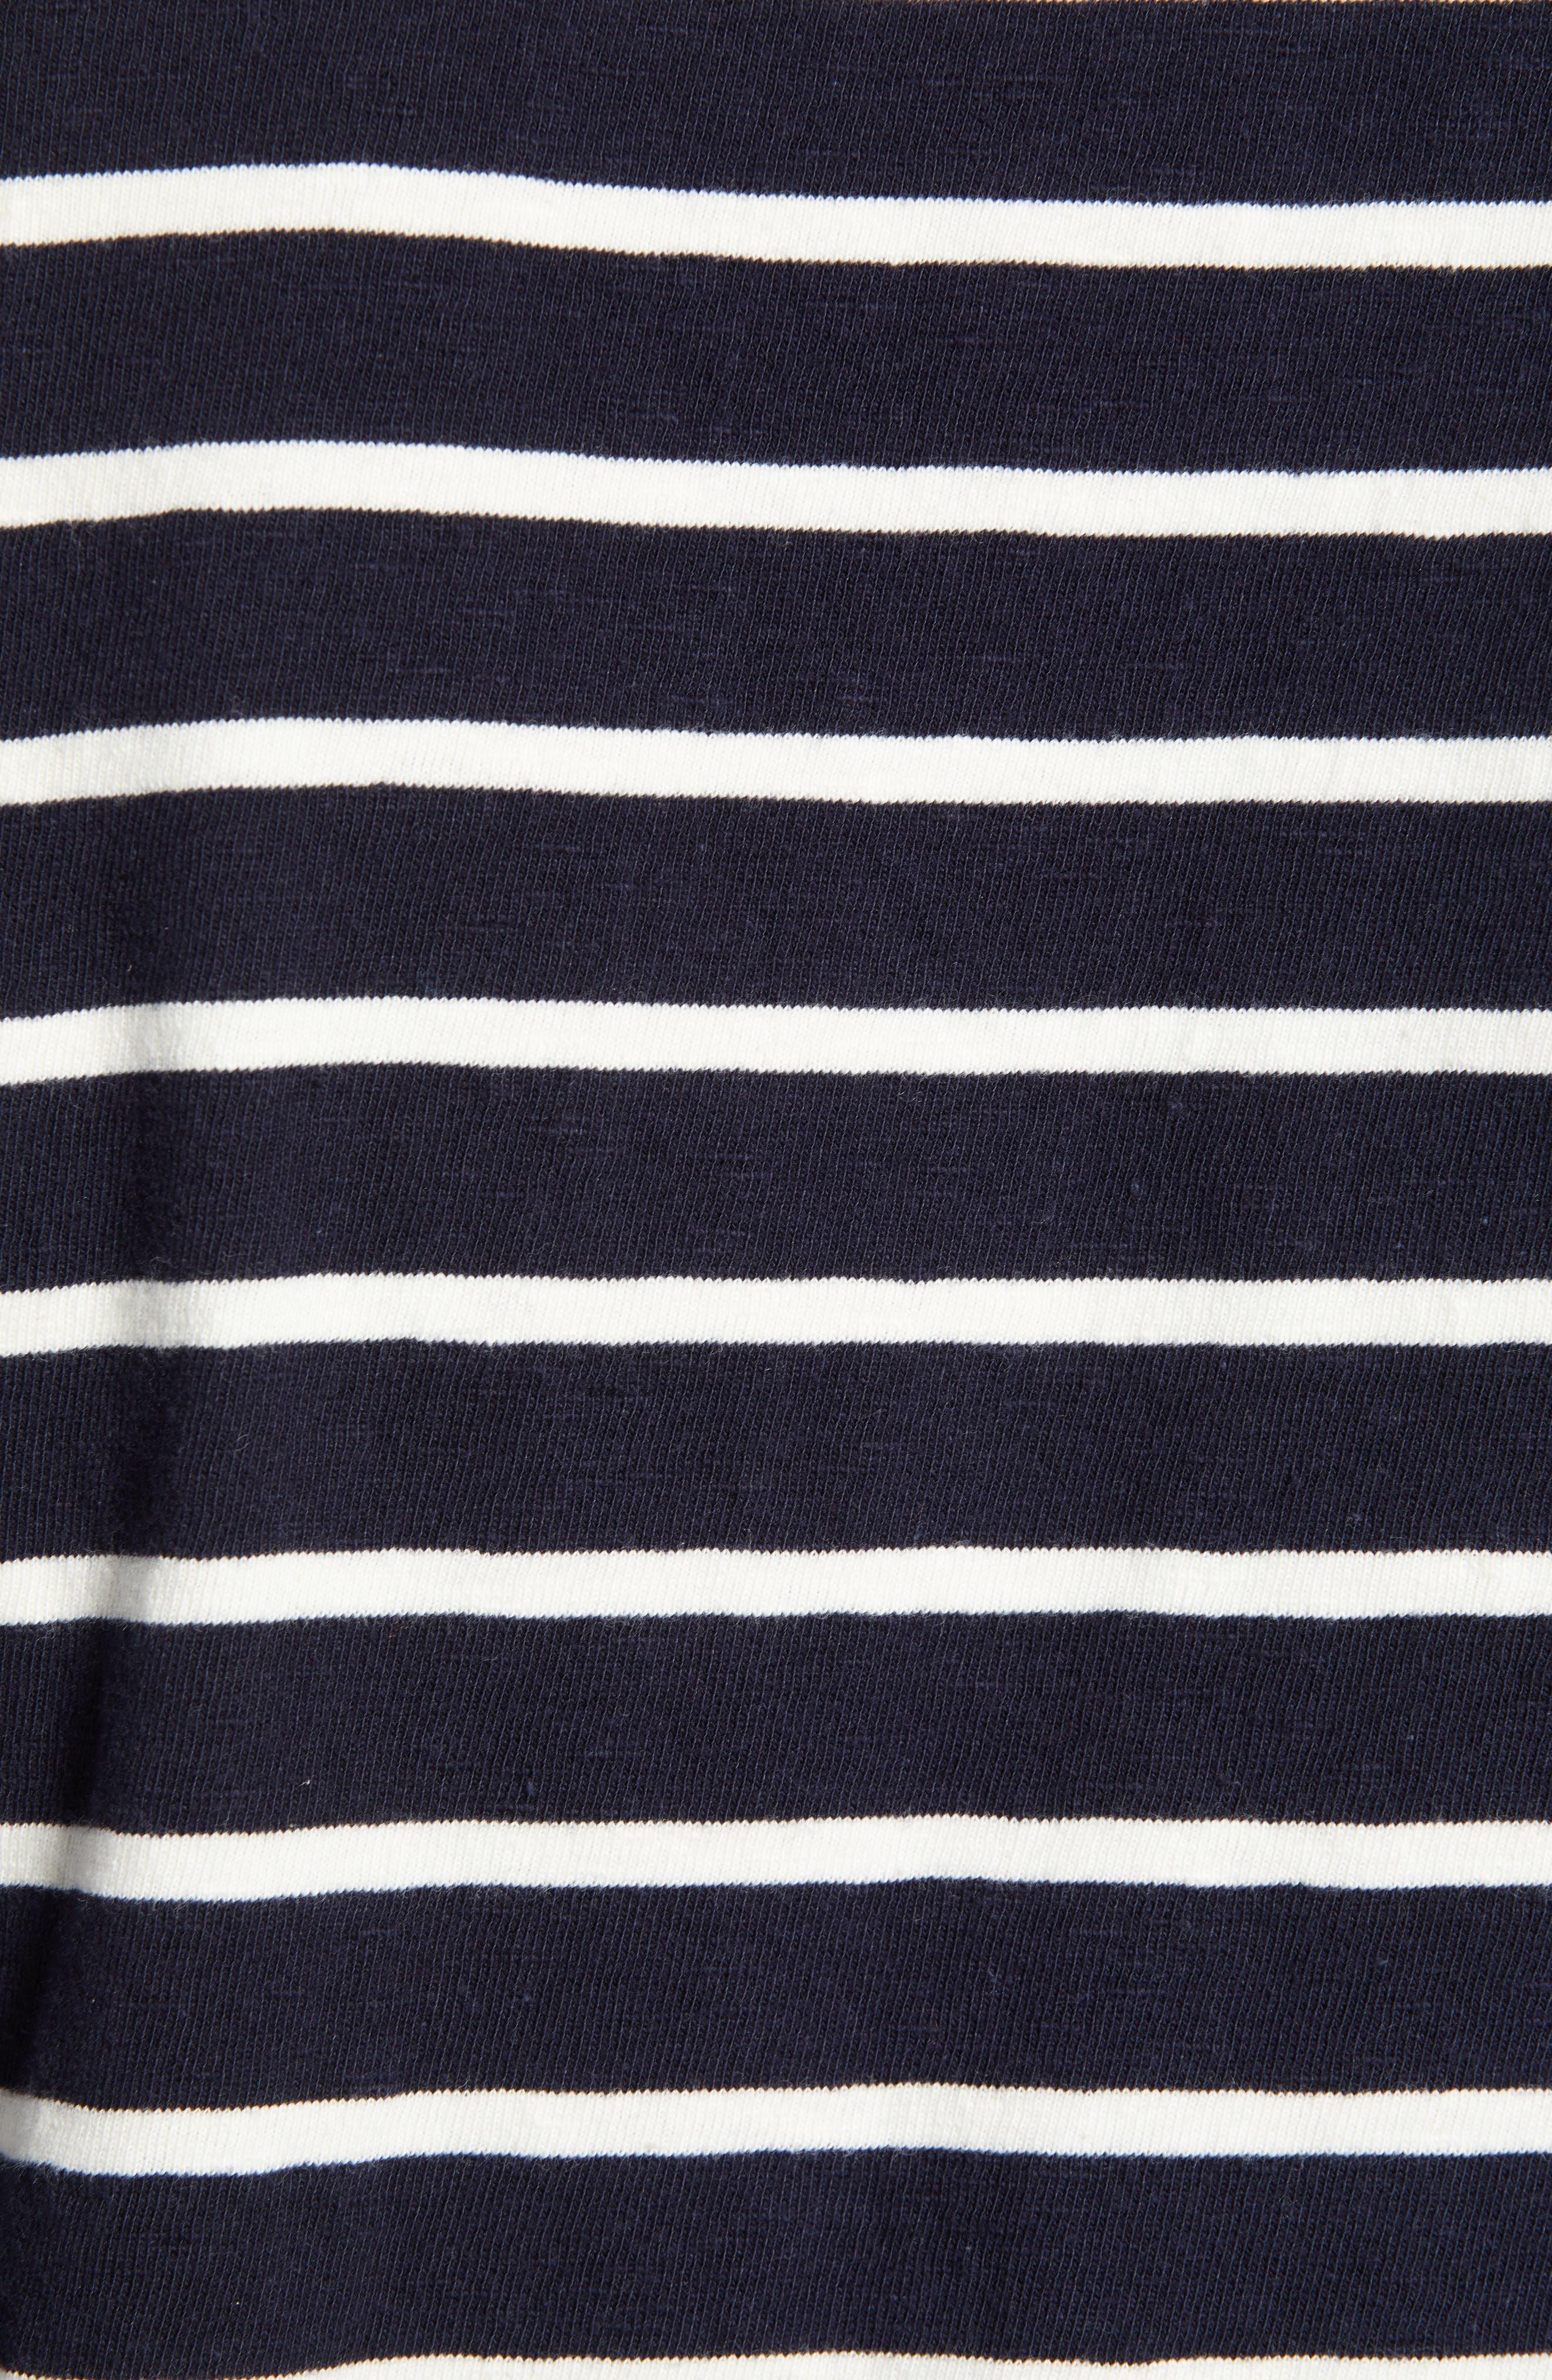 Stripe Long Sleeve T-Shirt,                             Alternate thumbnail 5, color,                             NAVY NIGHT ECRU STRIPE